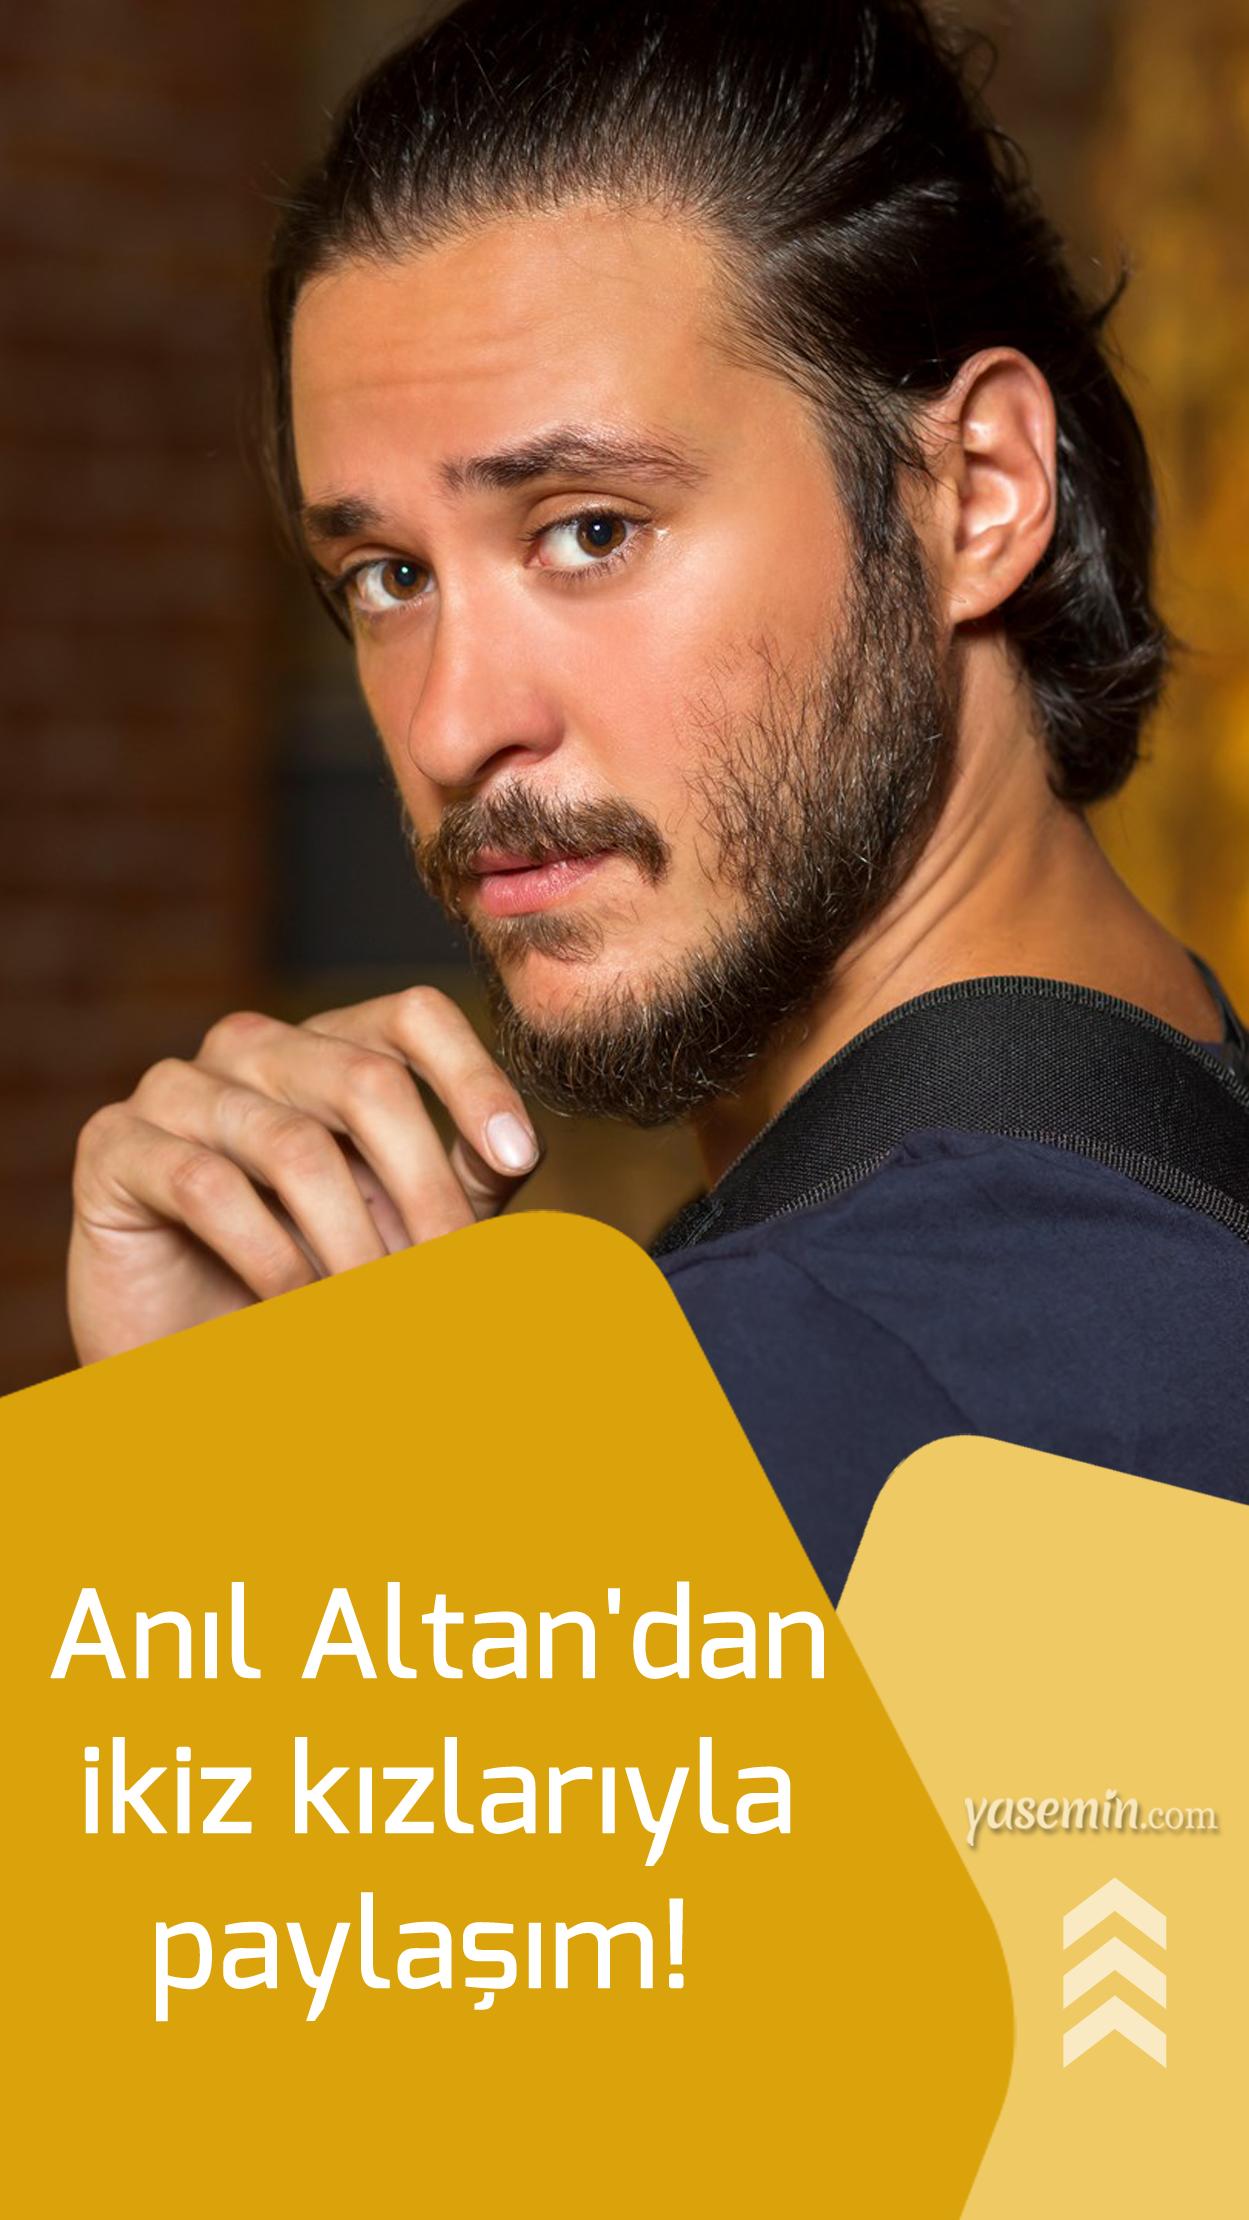 Anil Altan Dan Ikiz Kizlariyla Paylasim Babayla Bas Basa Kalinan Bir Gunden Babalar Ikiz Kizlar